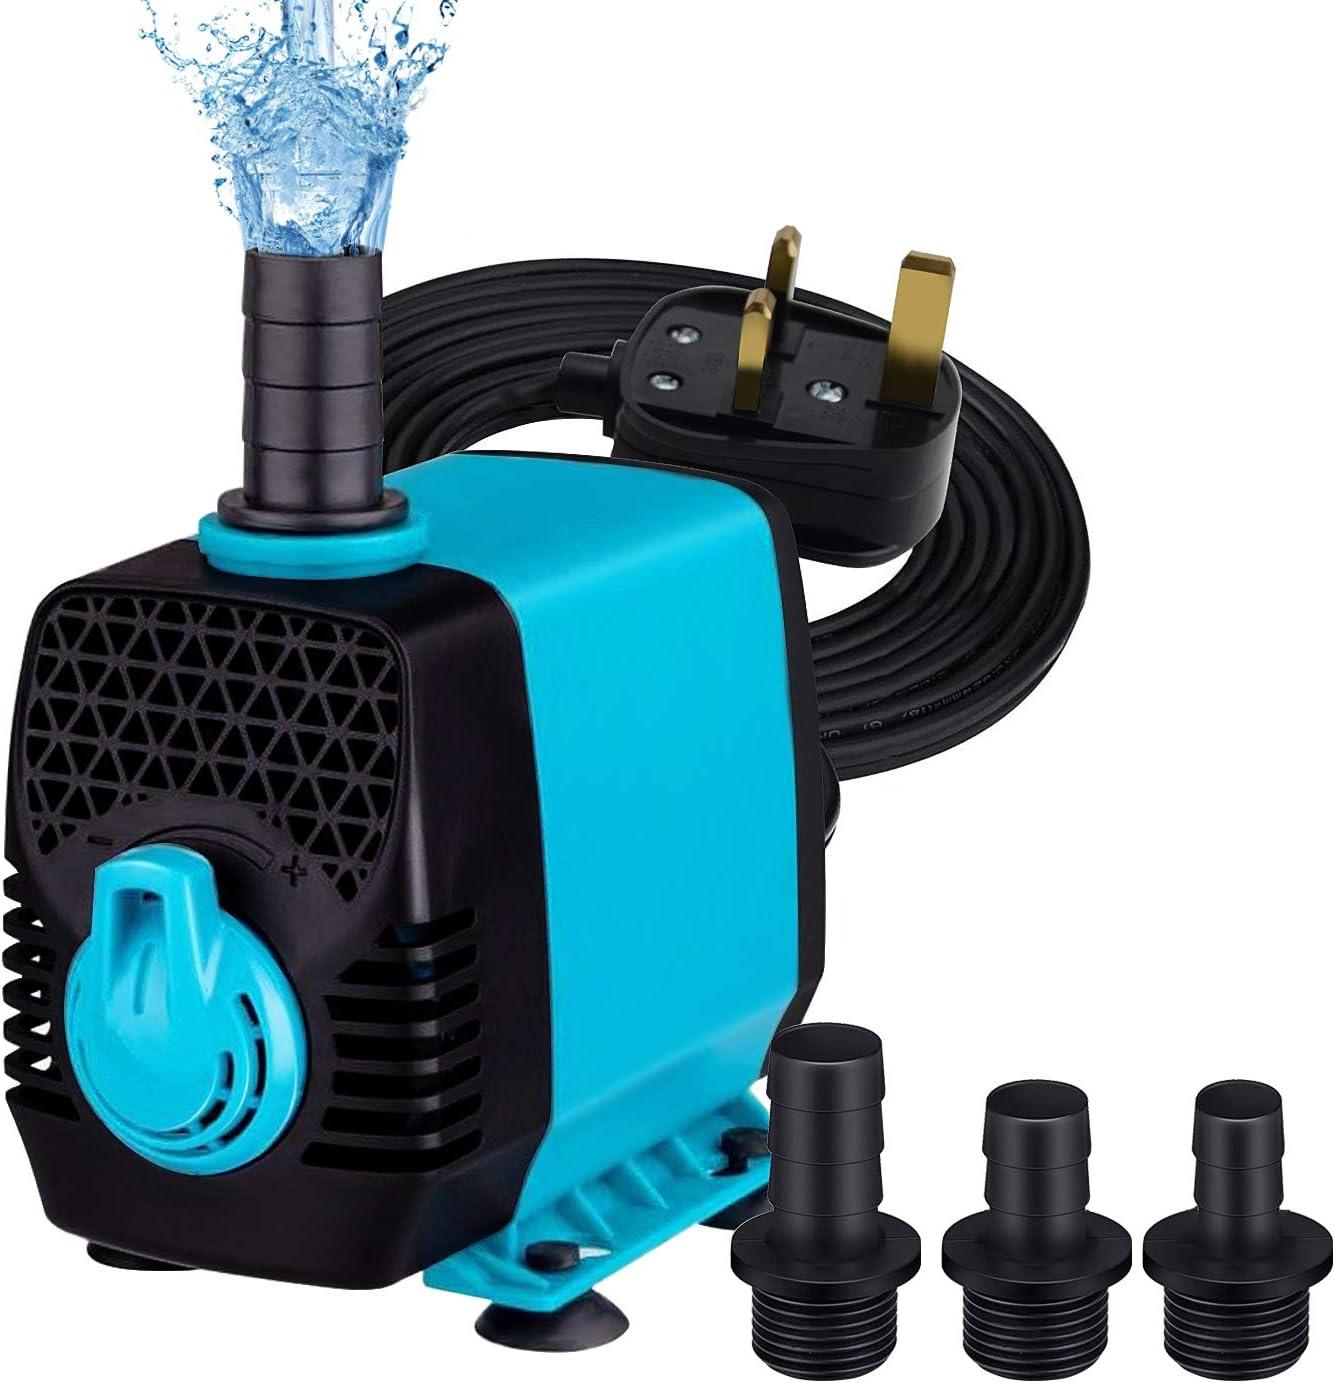 NO.17 Submersible Water Pump Aquarium Pump Ultra Quiet Pond Pump Underwater for Pond Garden Fountain Aquarium